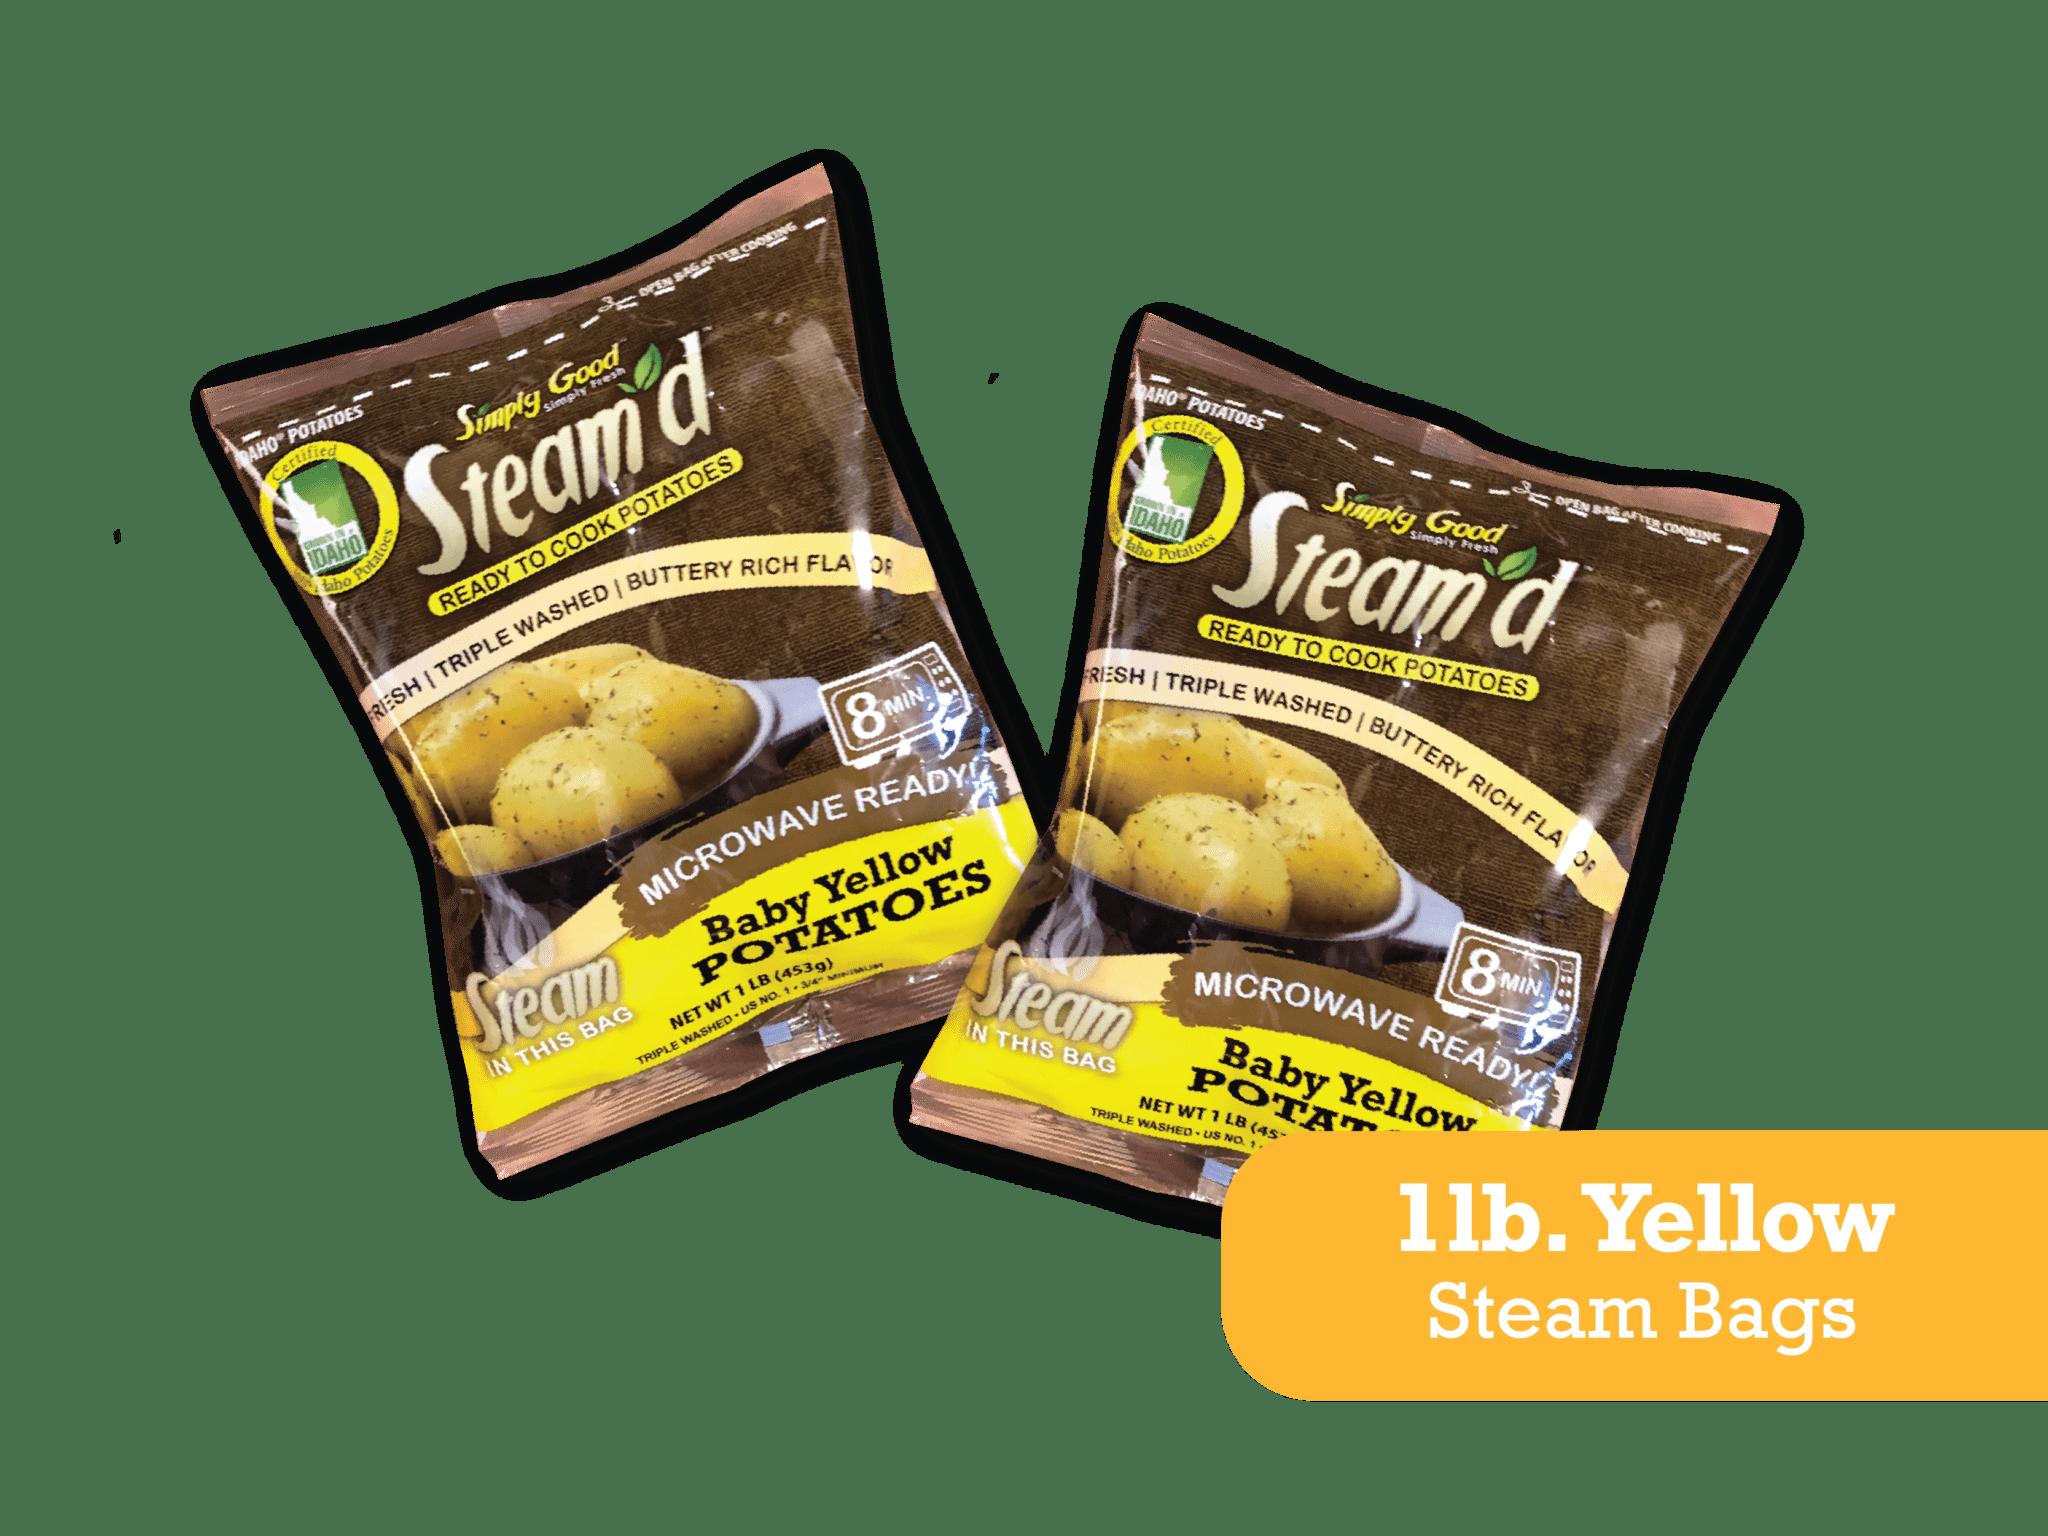 Eagle Eye Produce Steam'd Baby Yellow Potatoes 1 lb steam bags